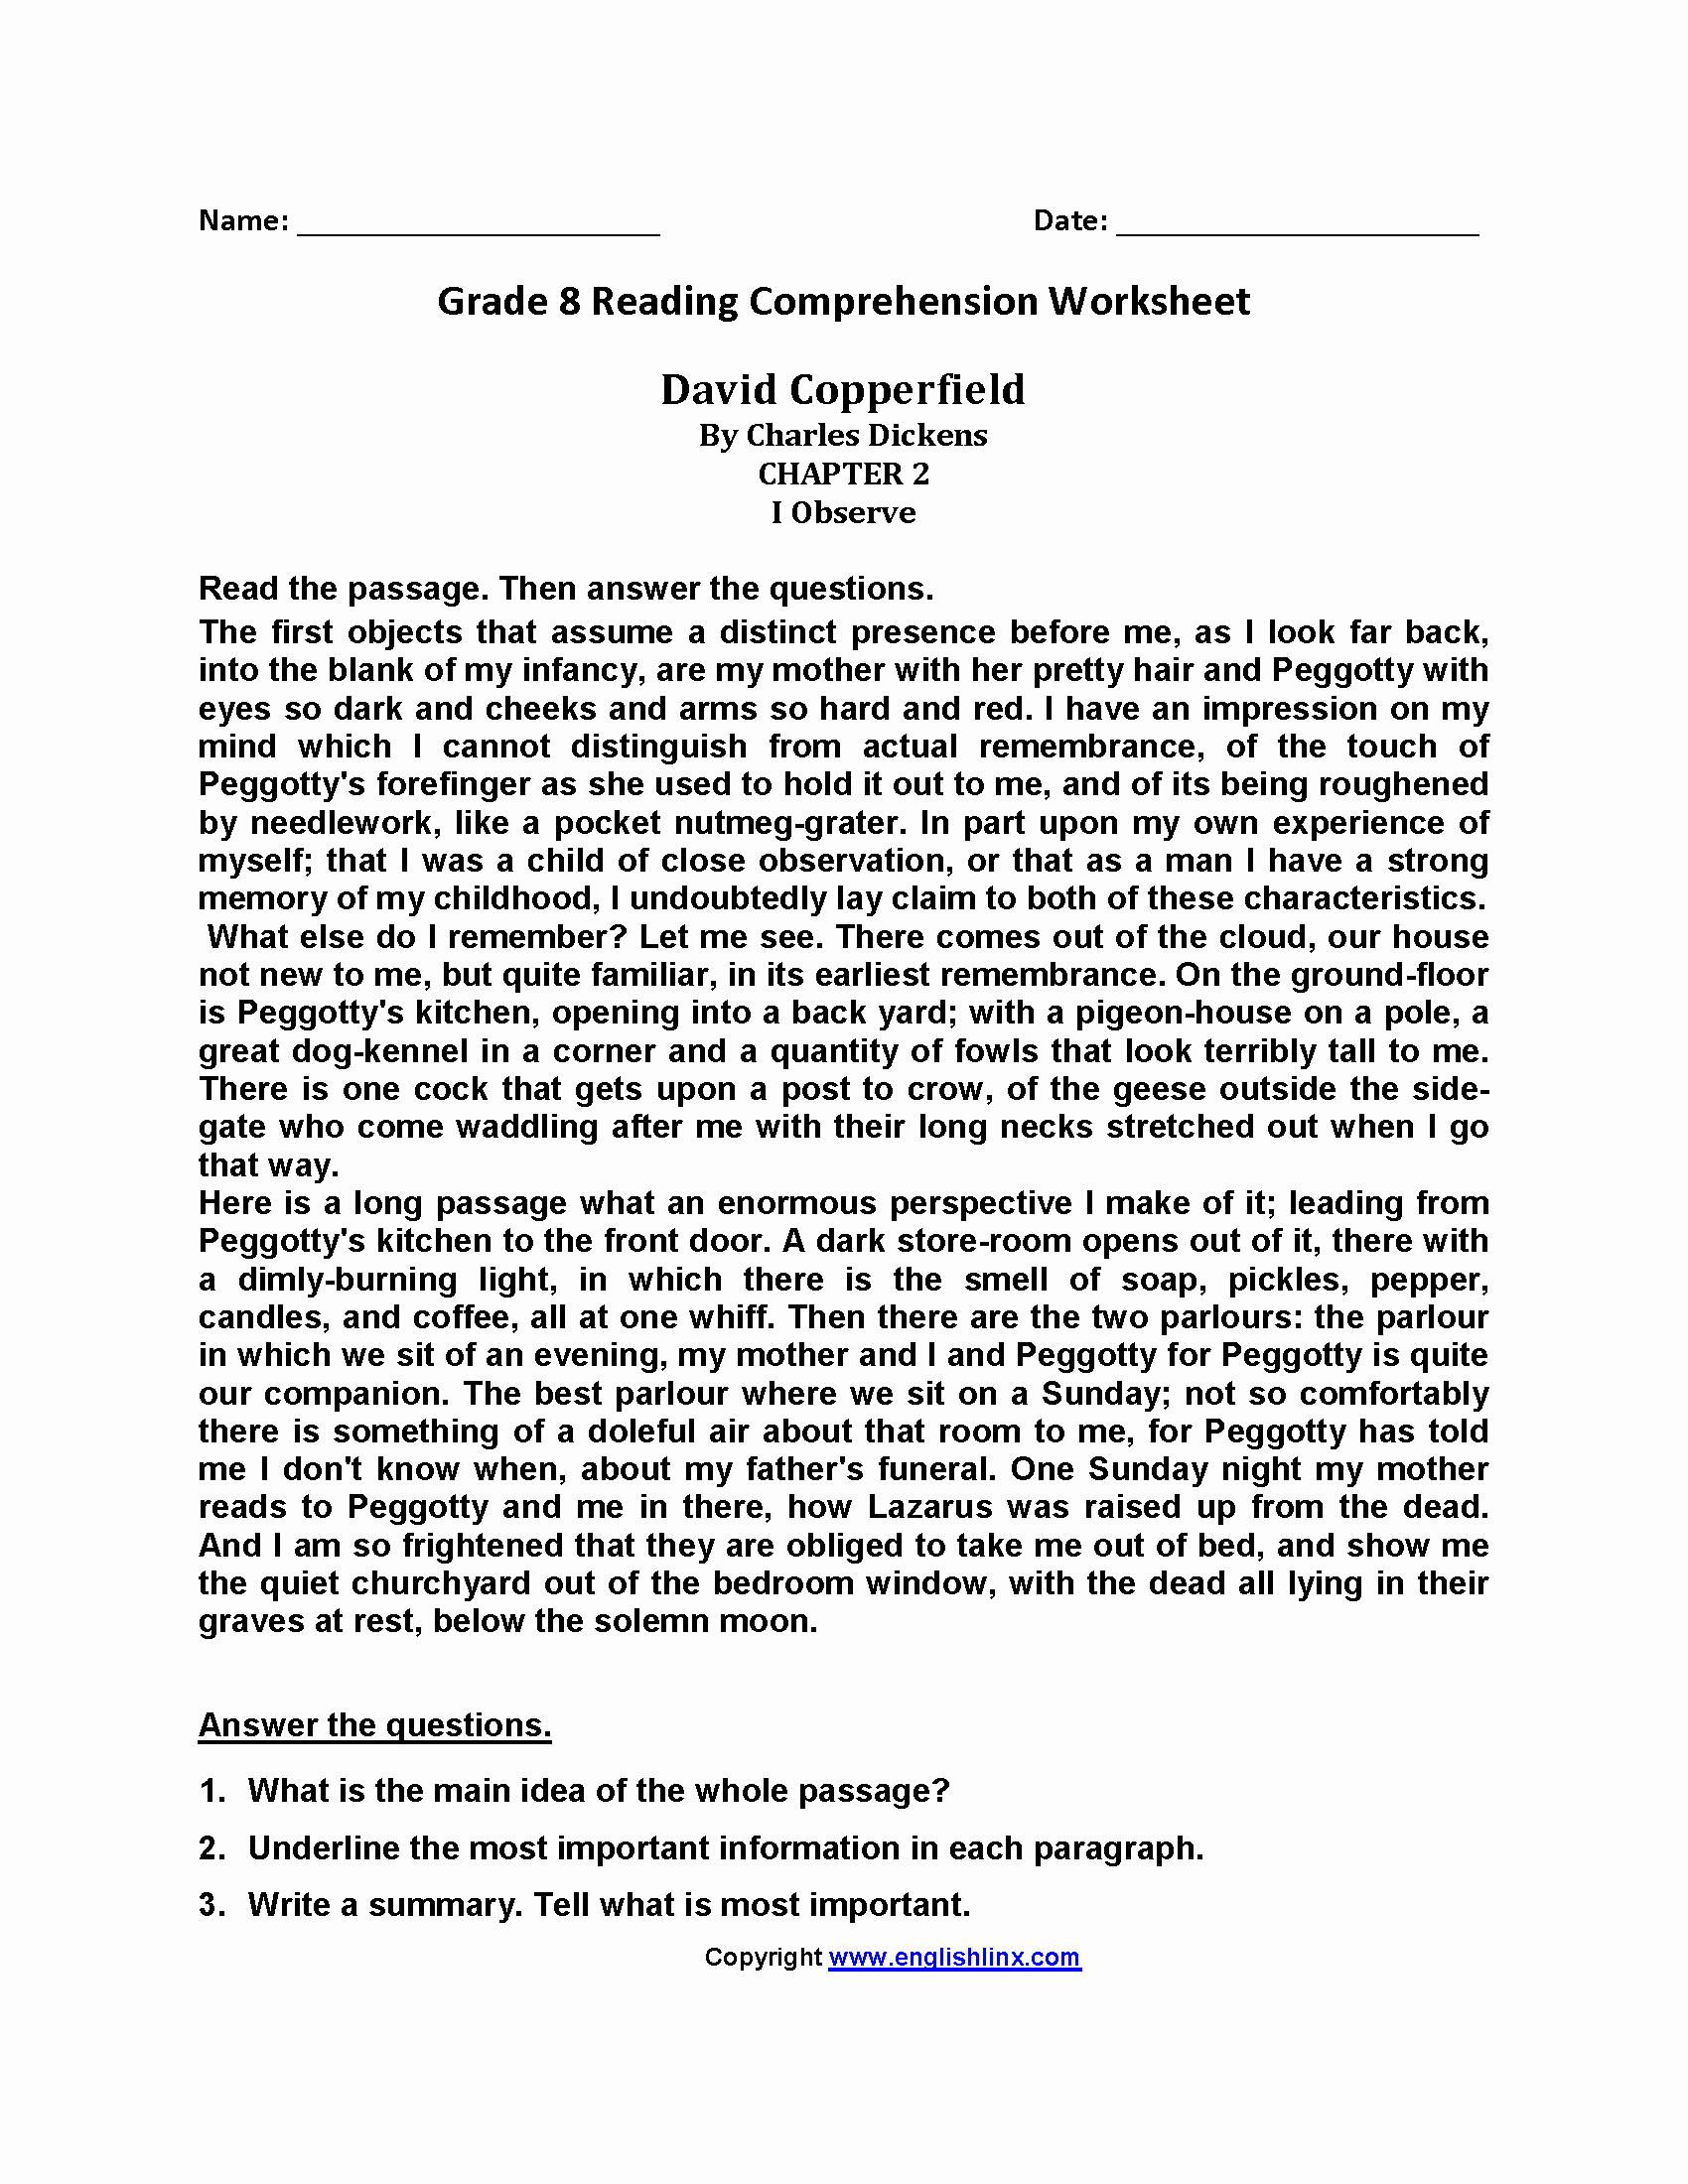 8th Grade Reading Worksheets Elegant David Copperfield Eighth Grade Reading Worksheets